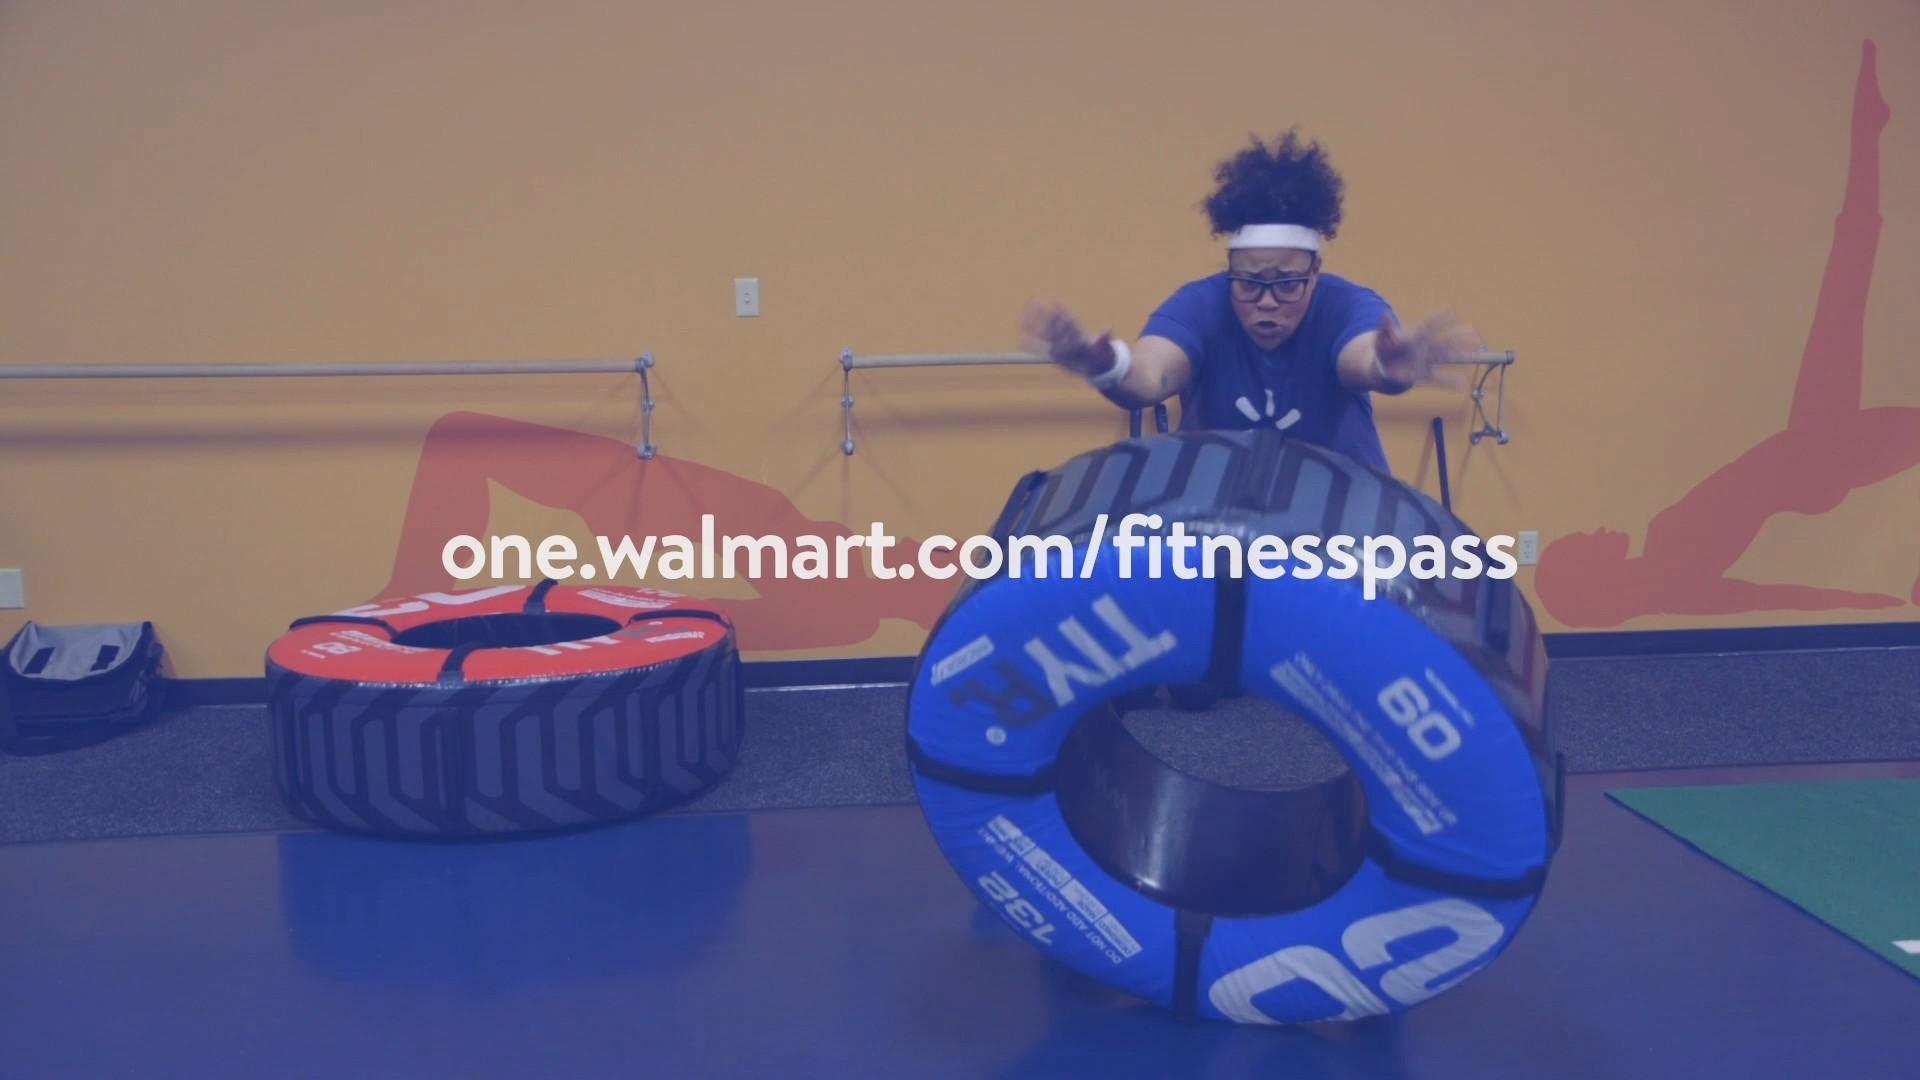 Fitnesspass_gym.jpg